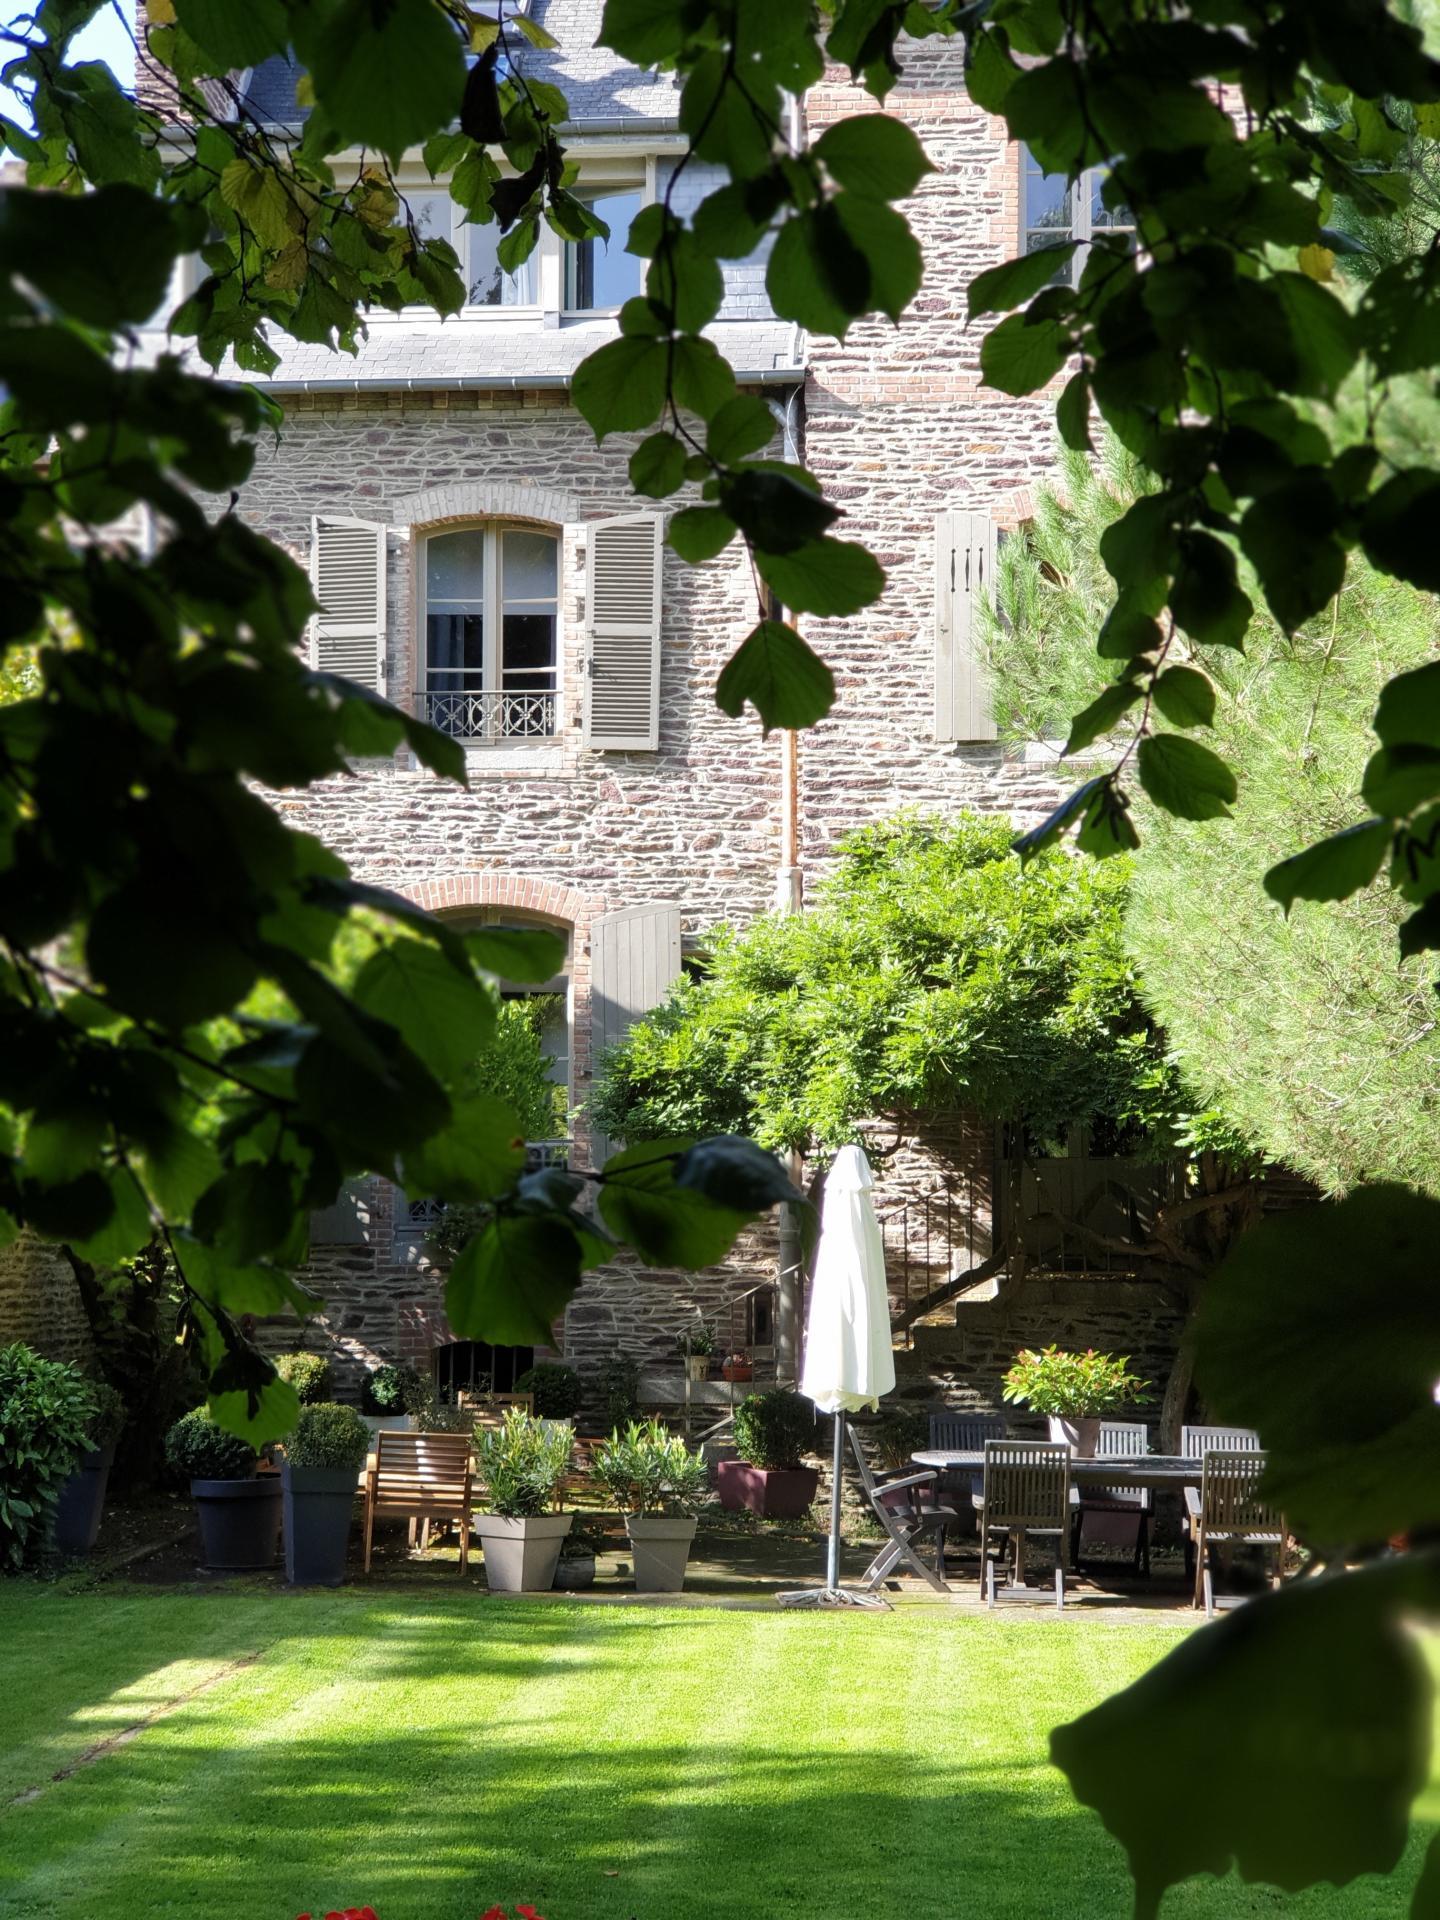 Jardin castel jolly maison d hotes rennes